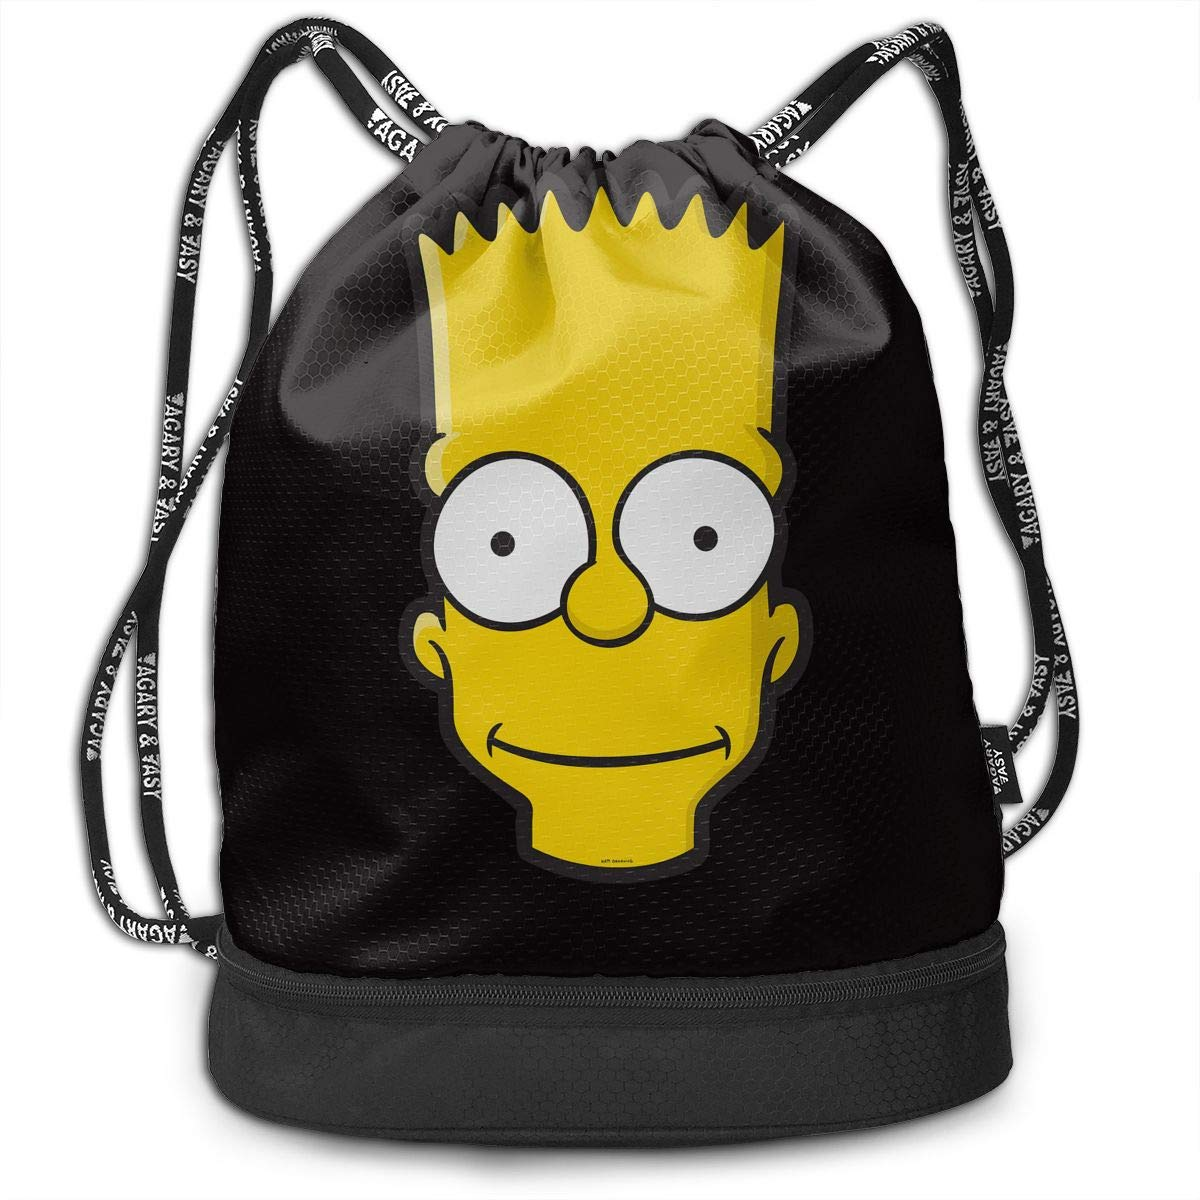 Men&Women Bart Simpson Gym Bag Lightweight Drawstring Backpack Hiking Travel Beach Yoga Running Sport Bookbag by LOPSCV